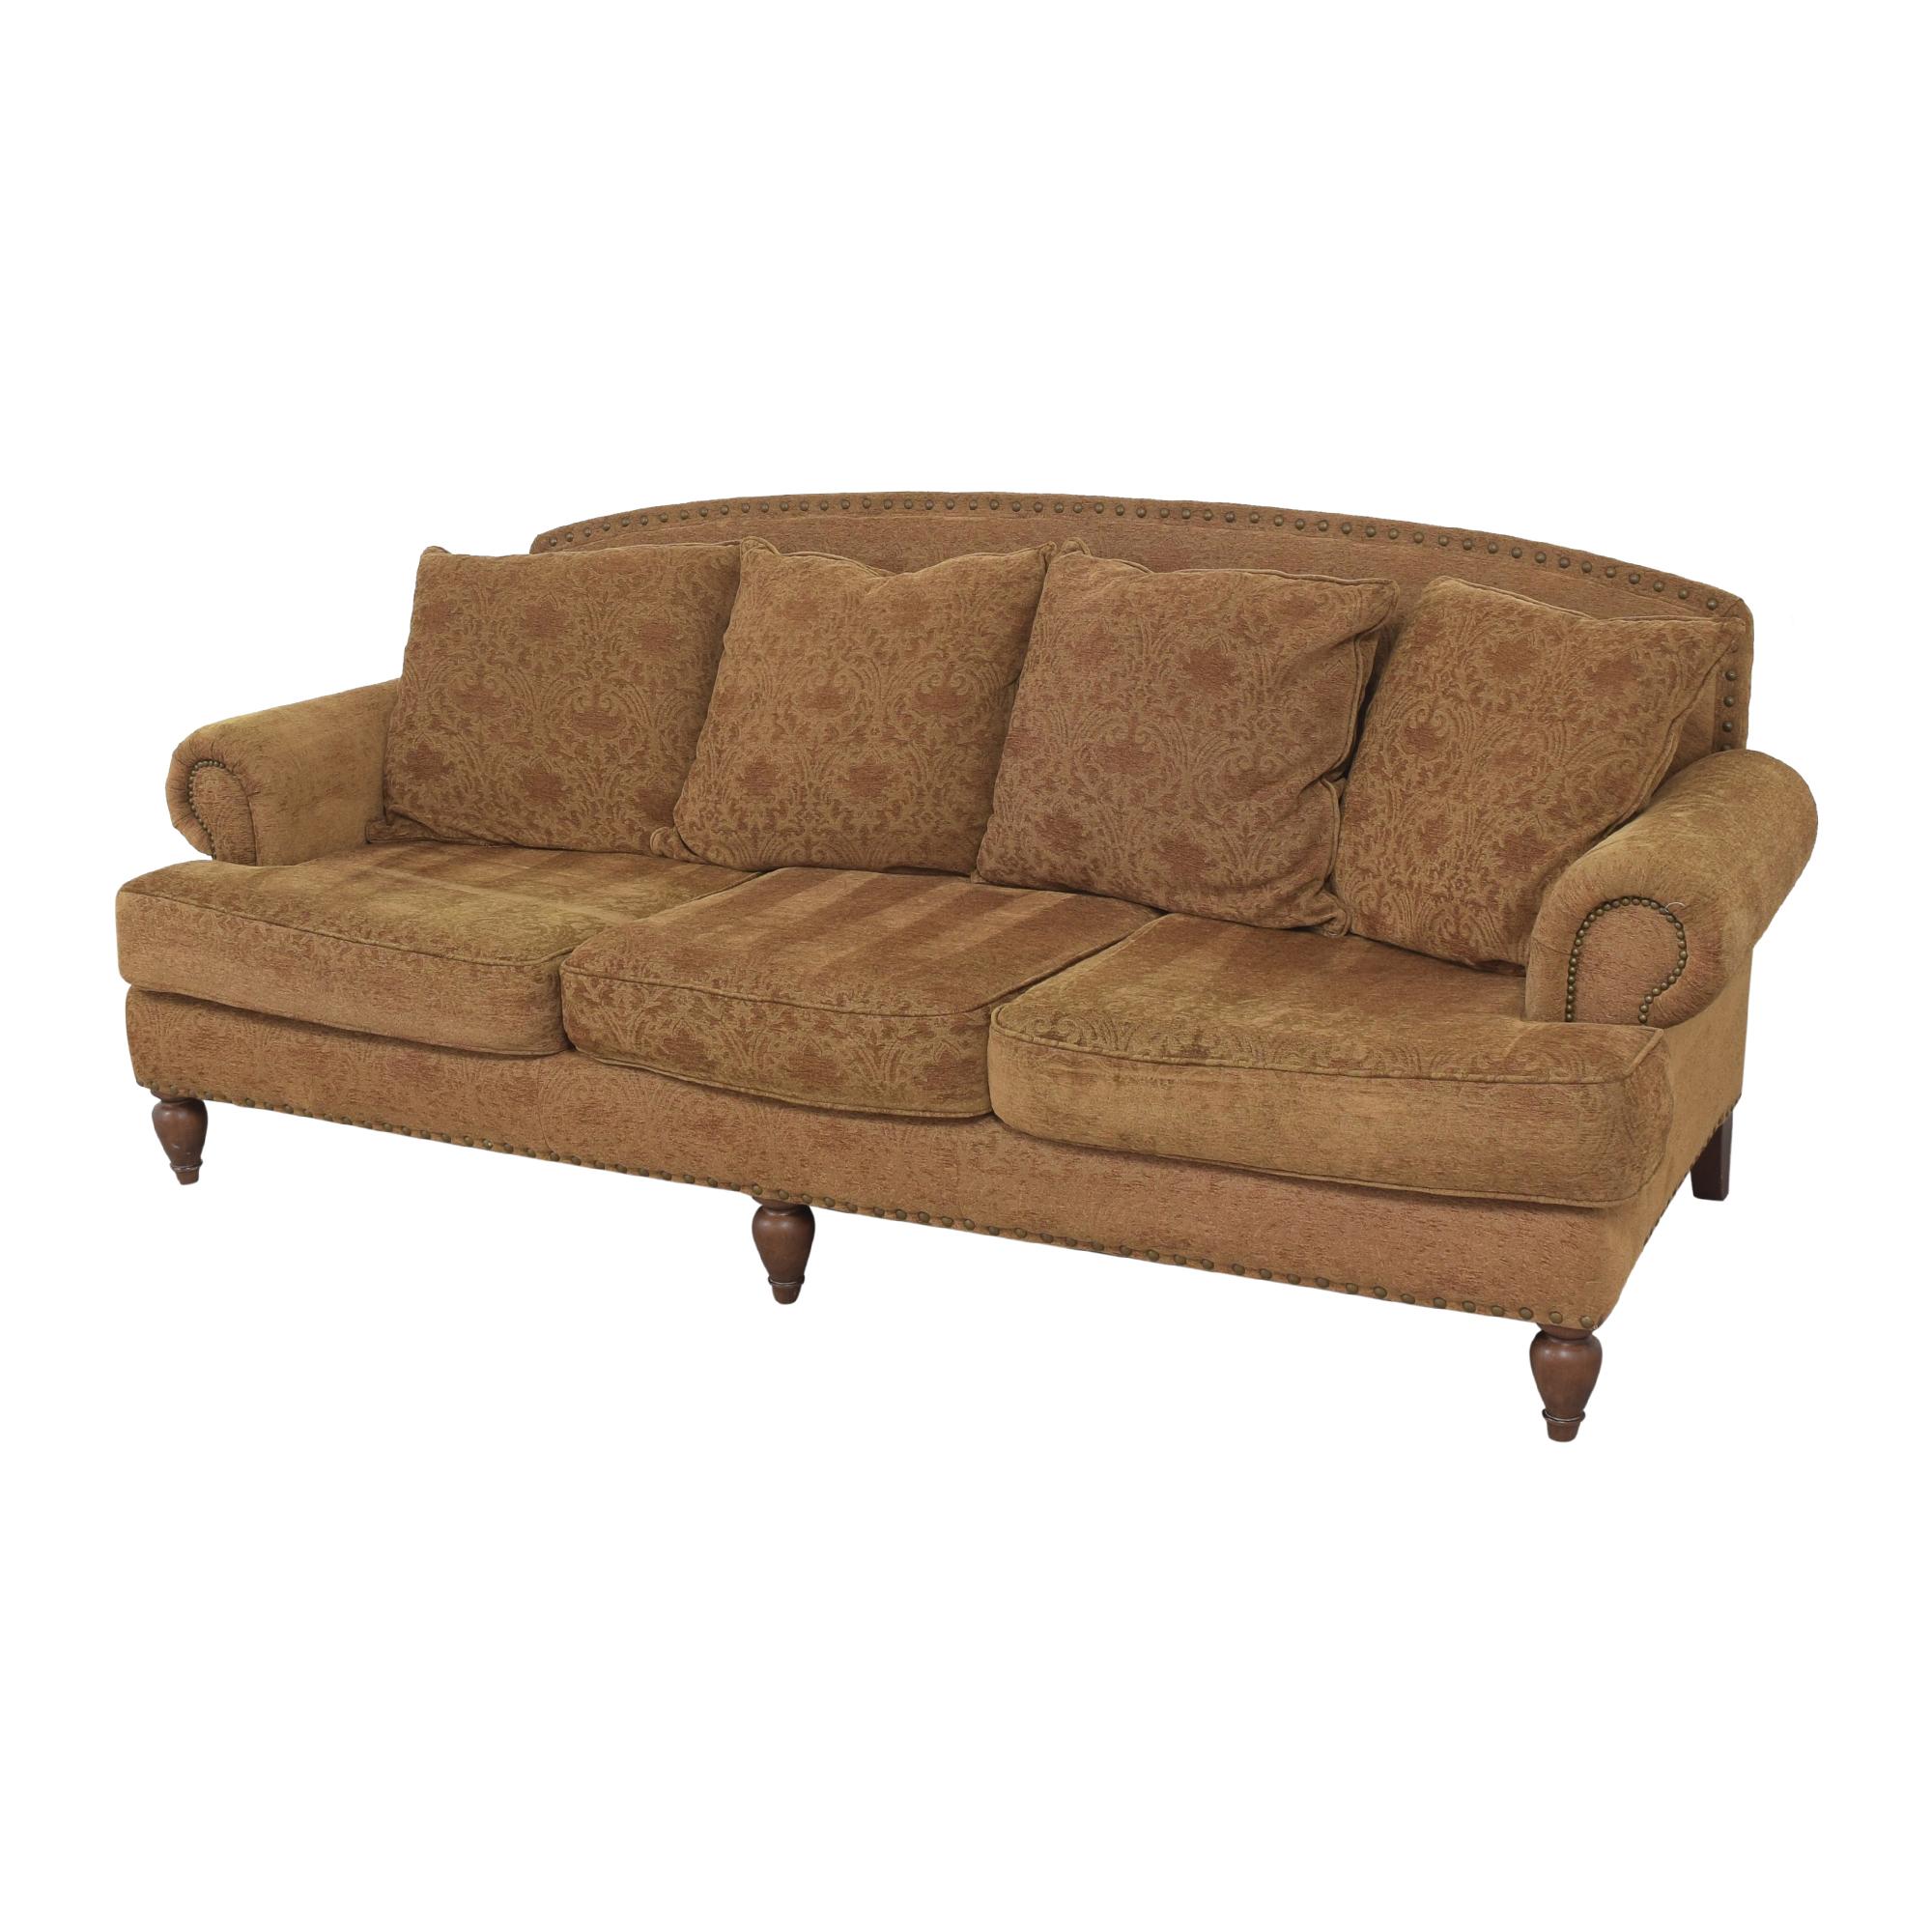 Bernhardt Bernhardt Three Cushion Roll Arm Sofa pa